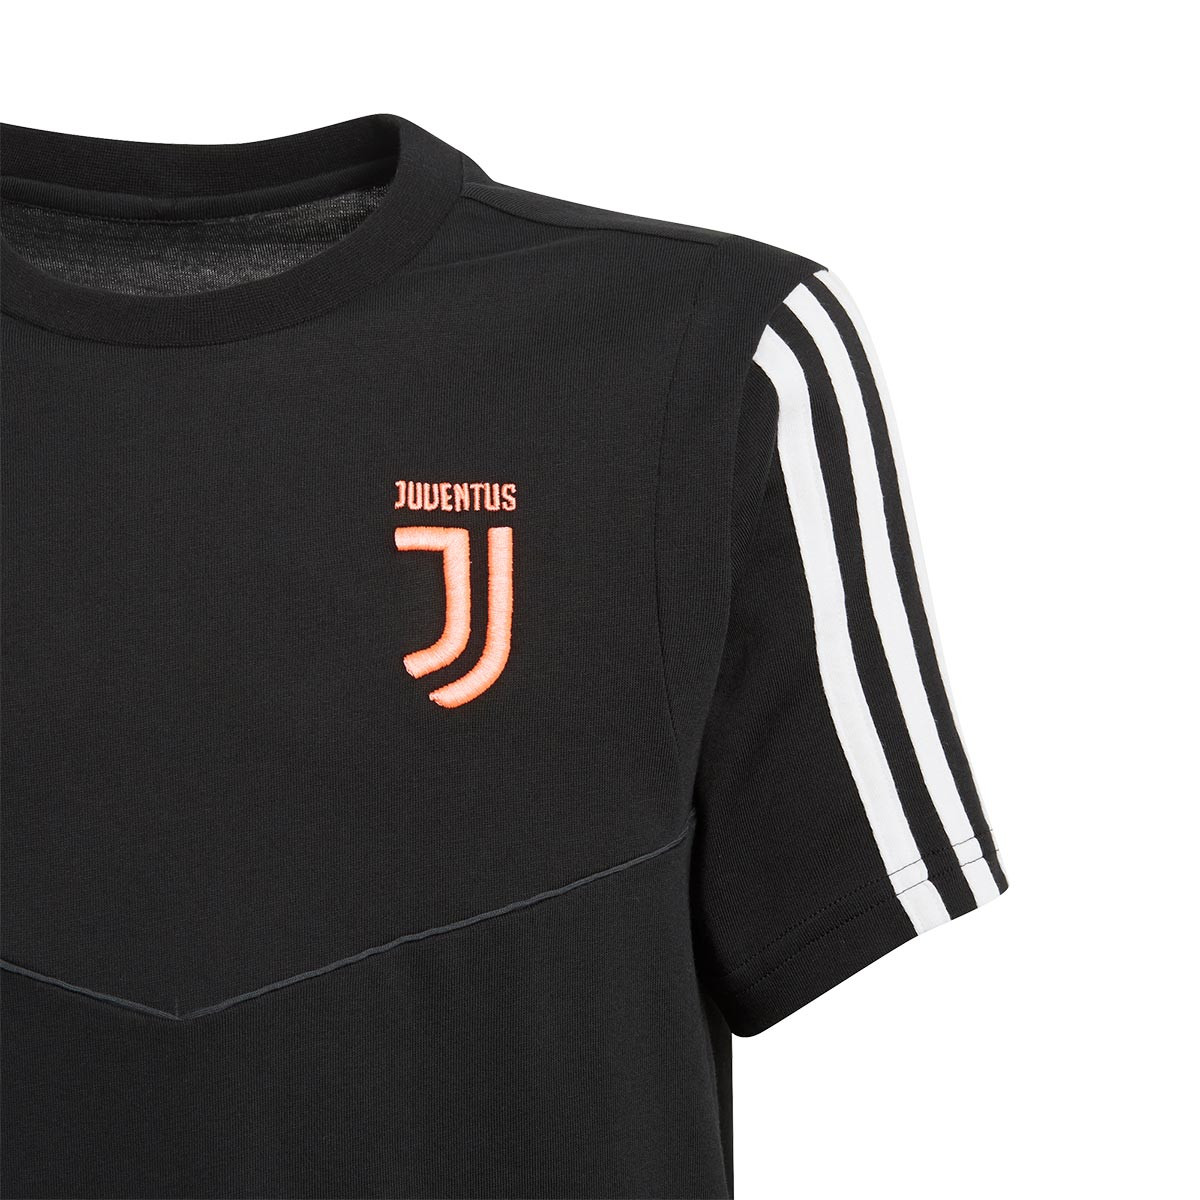 super popular daf93 488db Camiseta Juventus 2019-2020 Niño Black-Dark grey